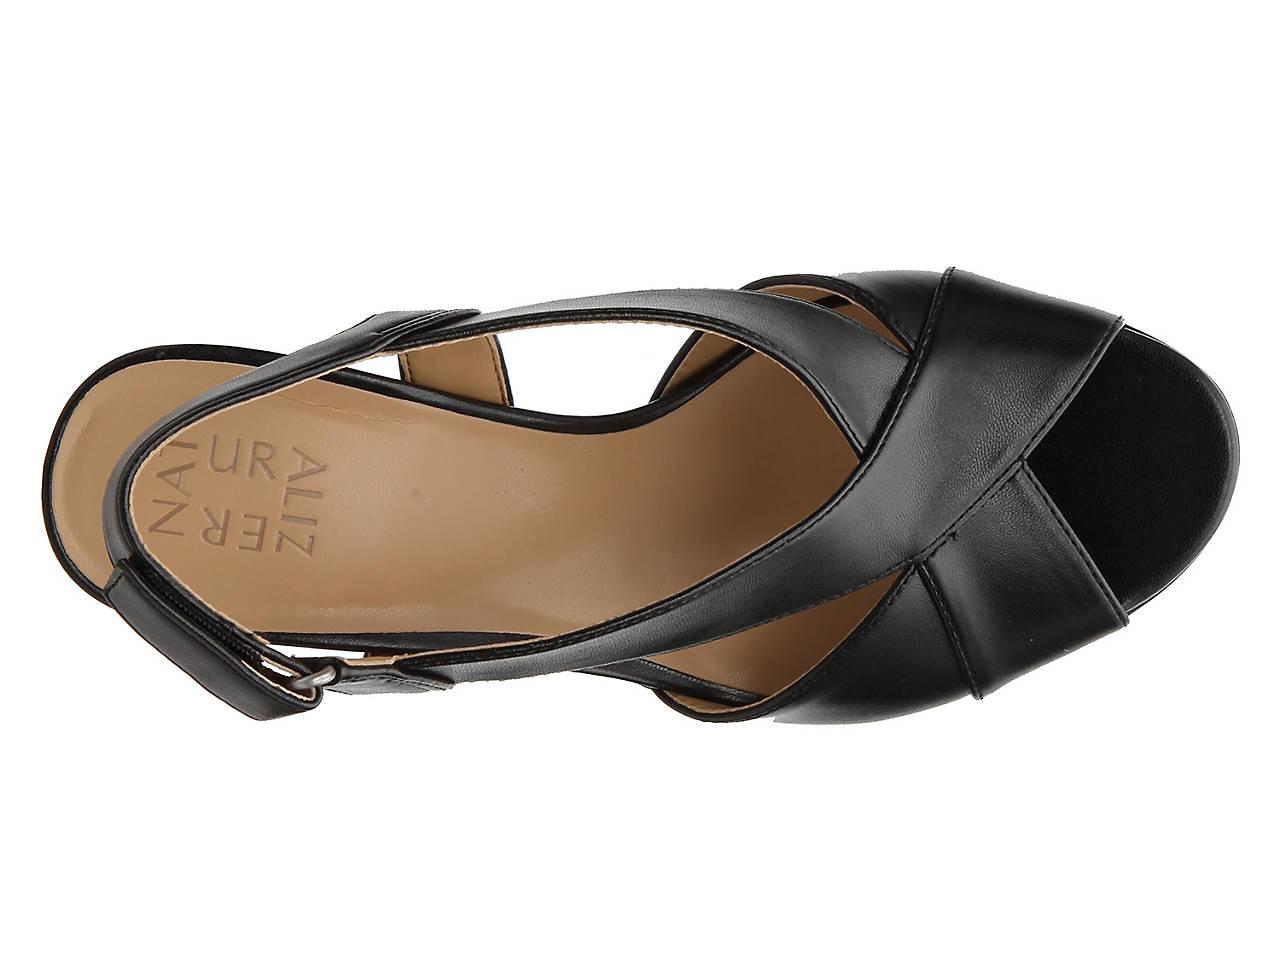 76f16fd2fc20 Naturalizer Barrie Sandal Women s Shoes